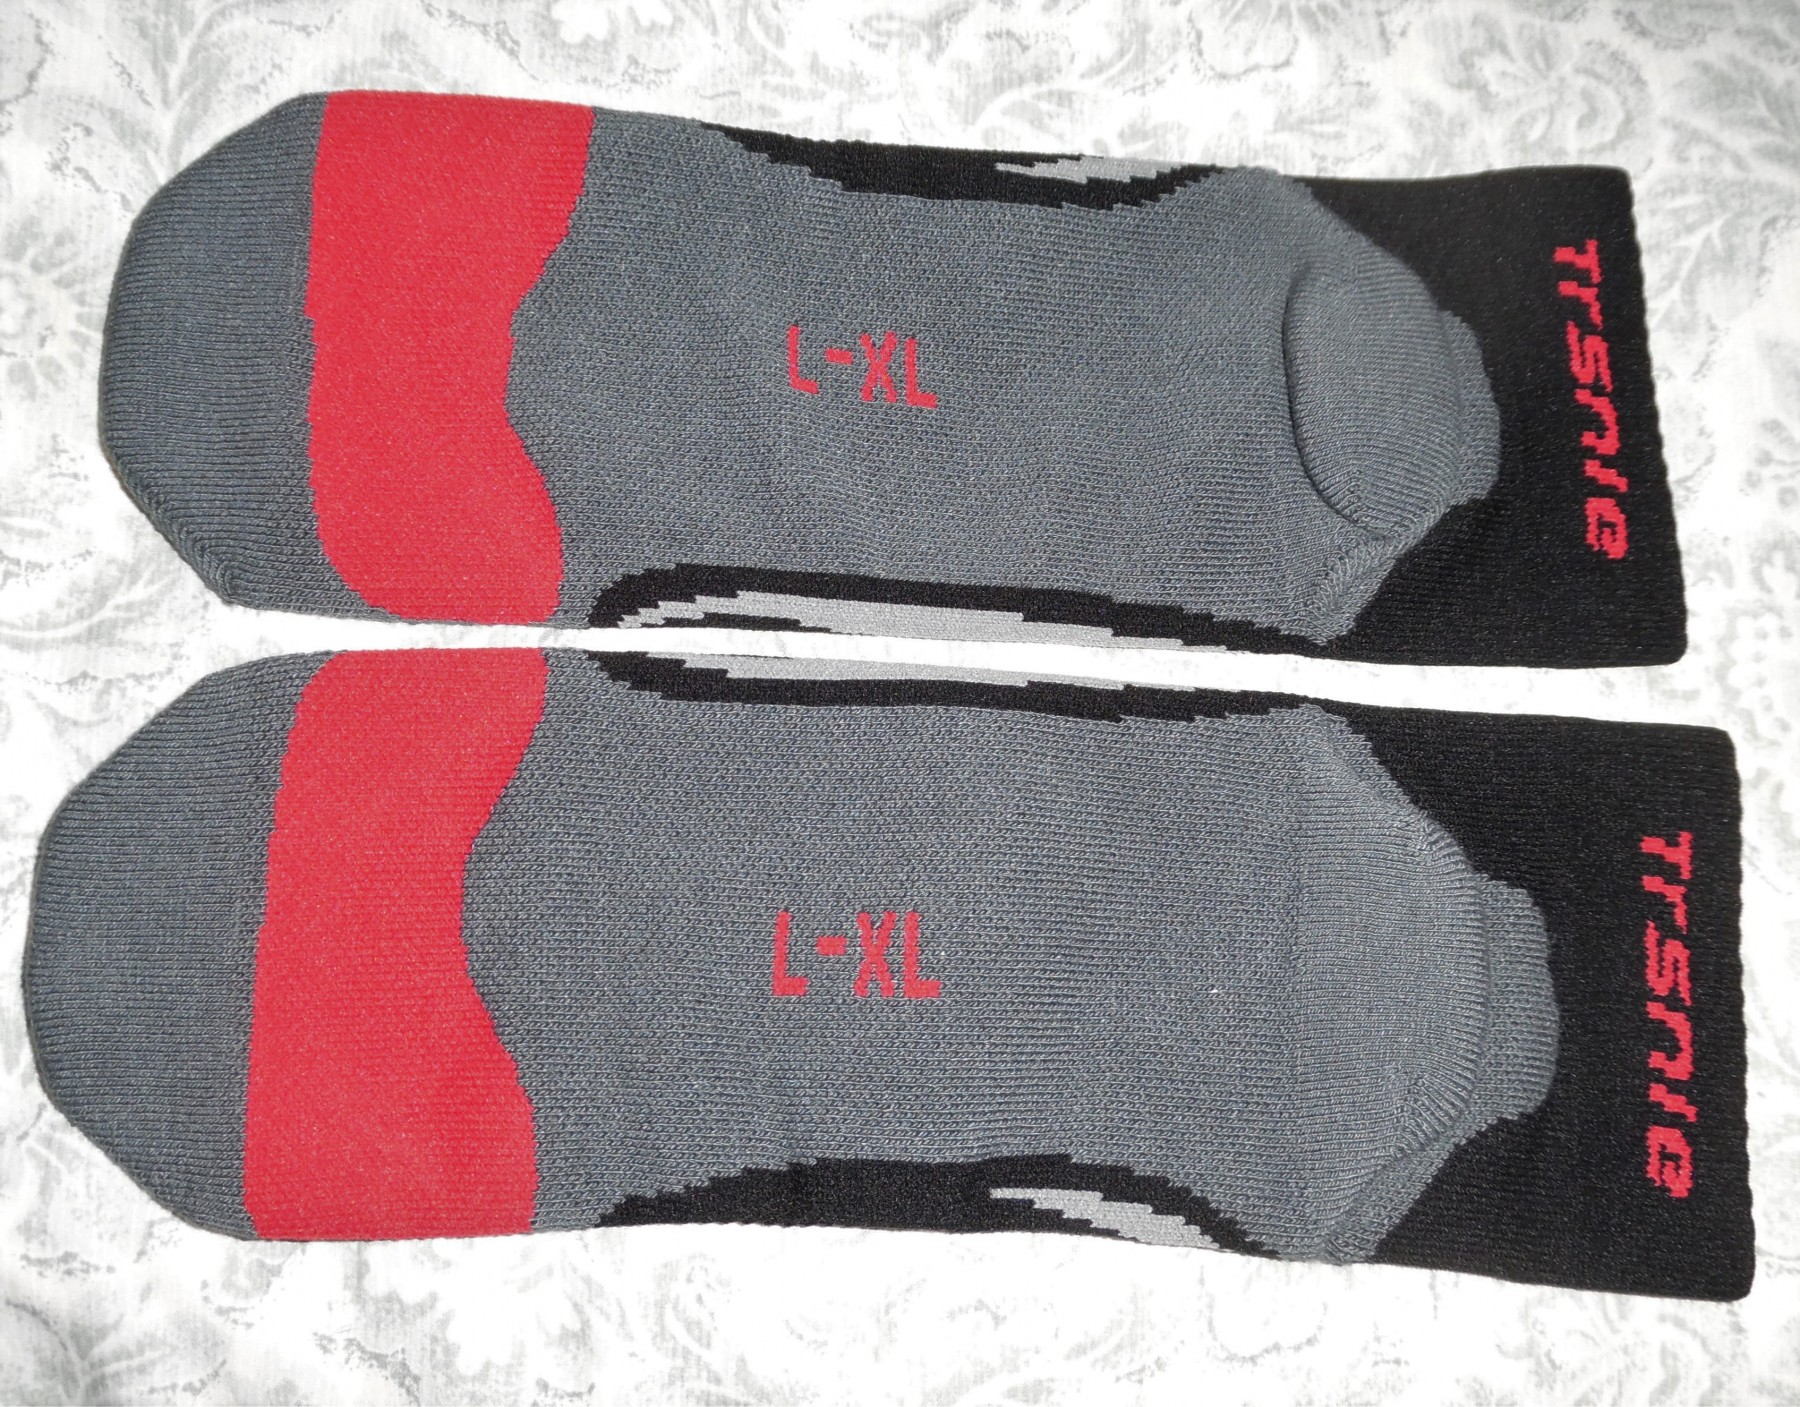 Super Comfortable Socks!